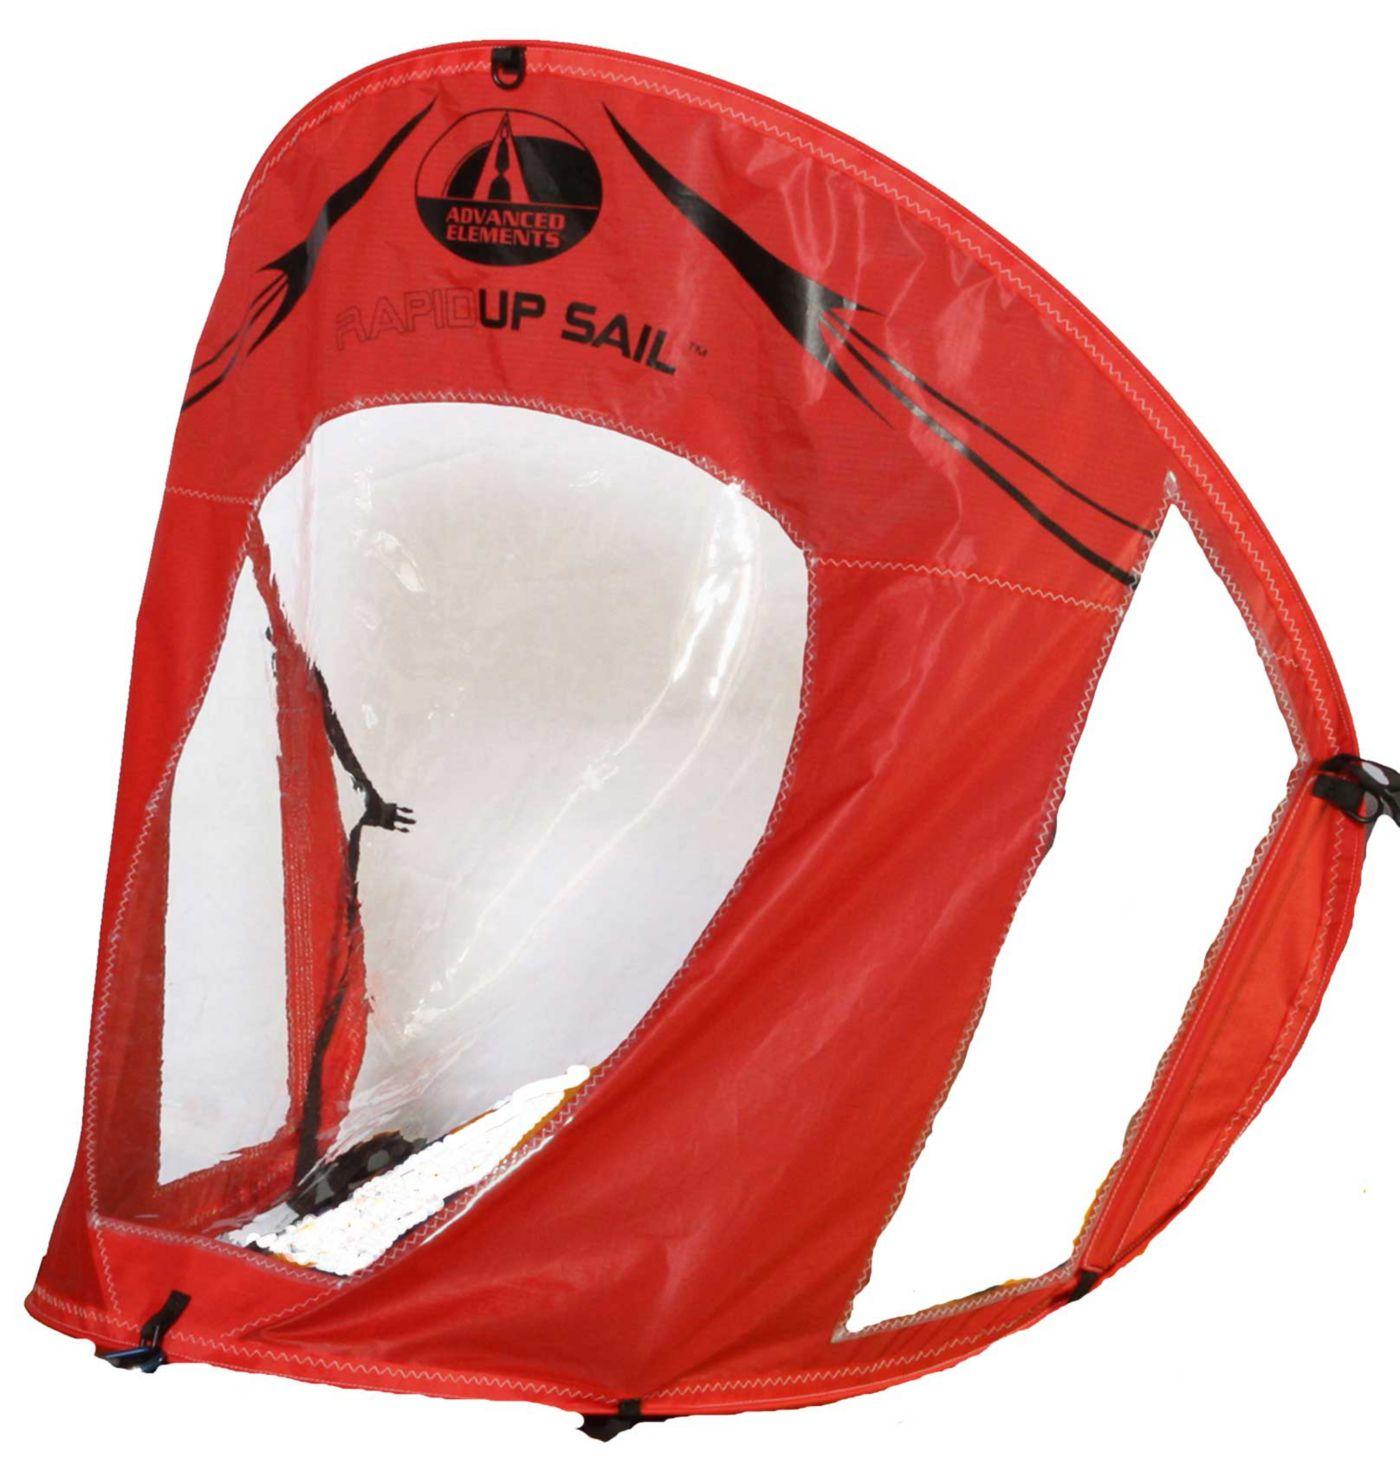 Advanced Elements RapidUp Kayak Sail